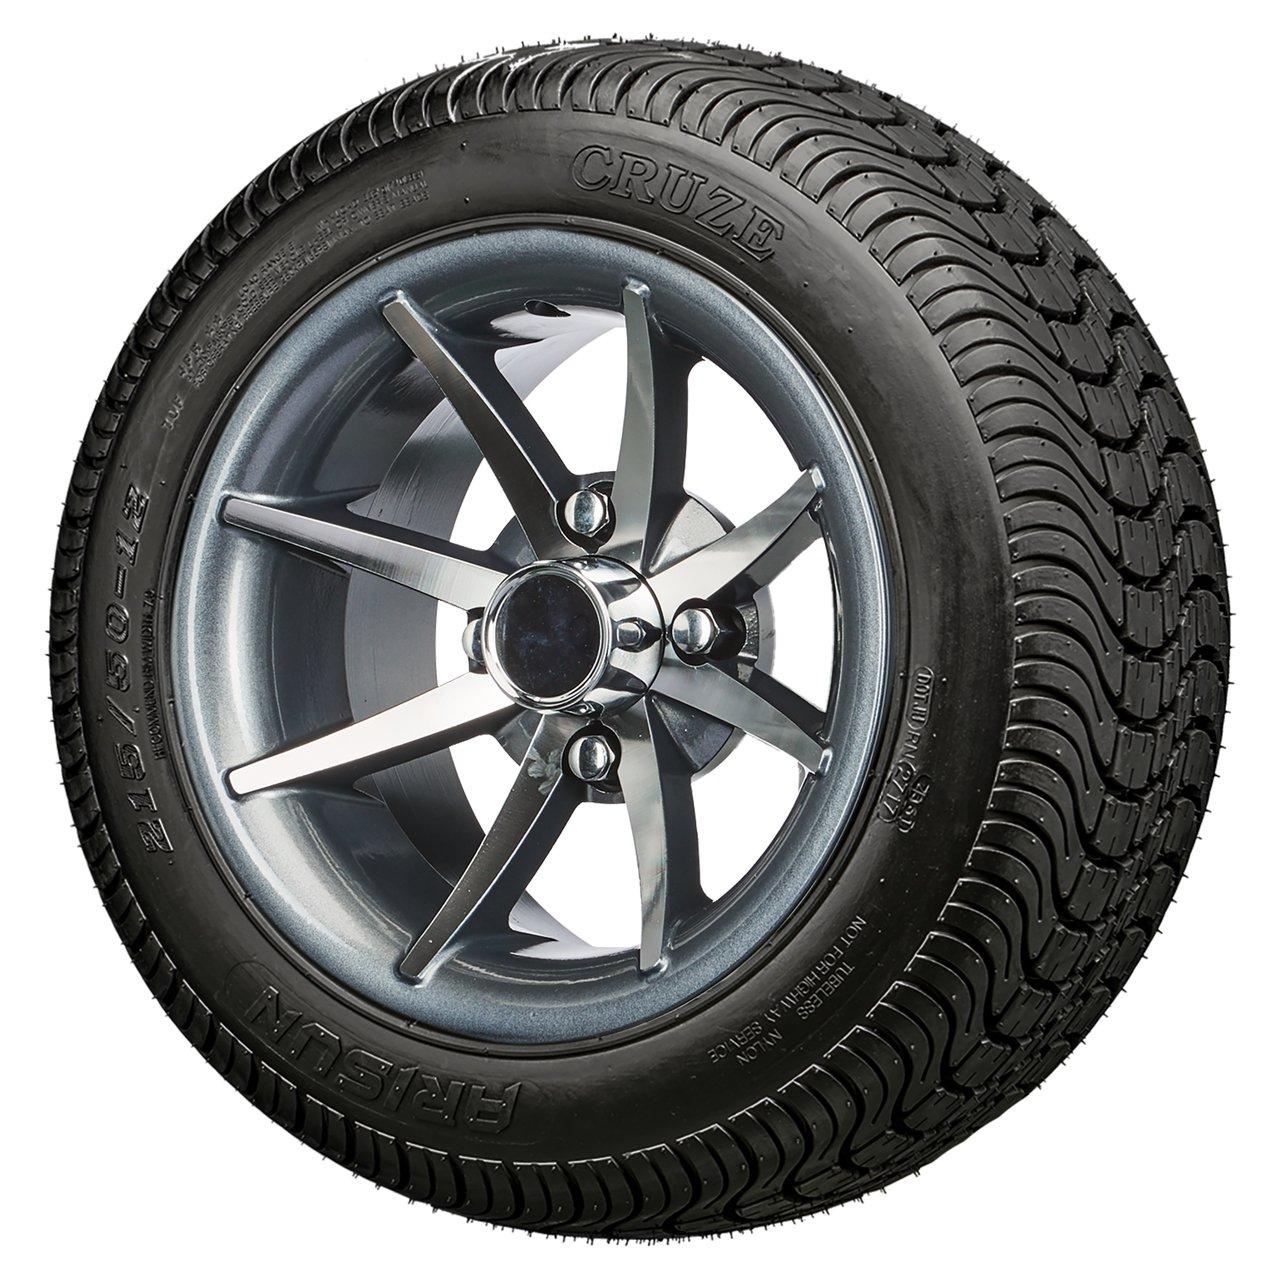 12'' Classic Gun Metal - Golf Cart LowPro Street Tire and Wheels Combo